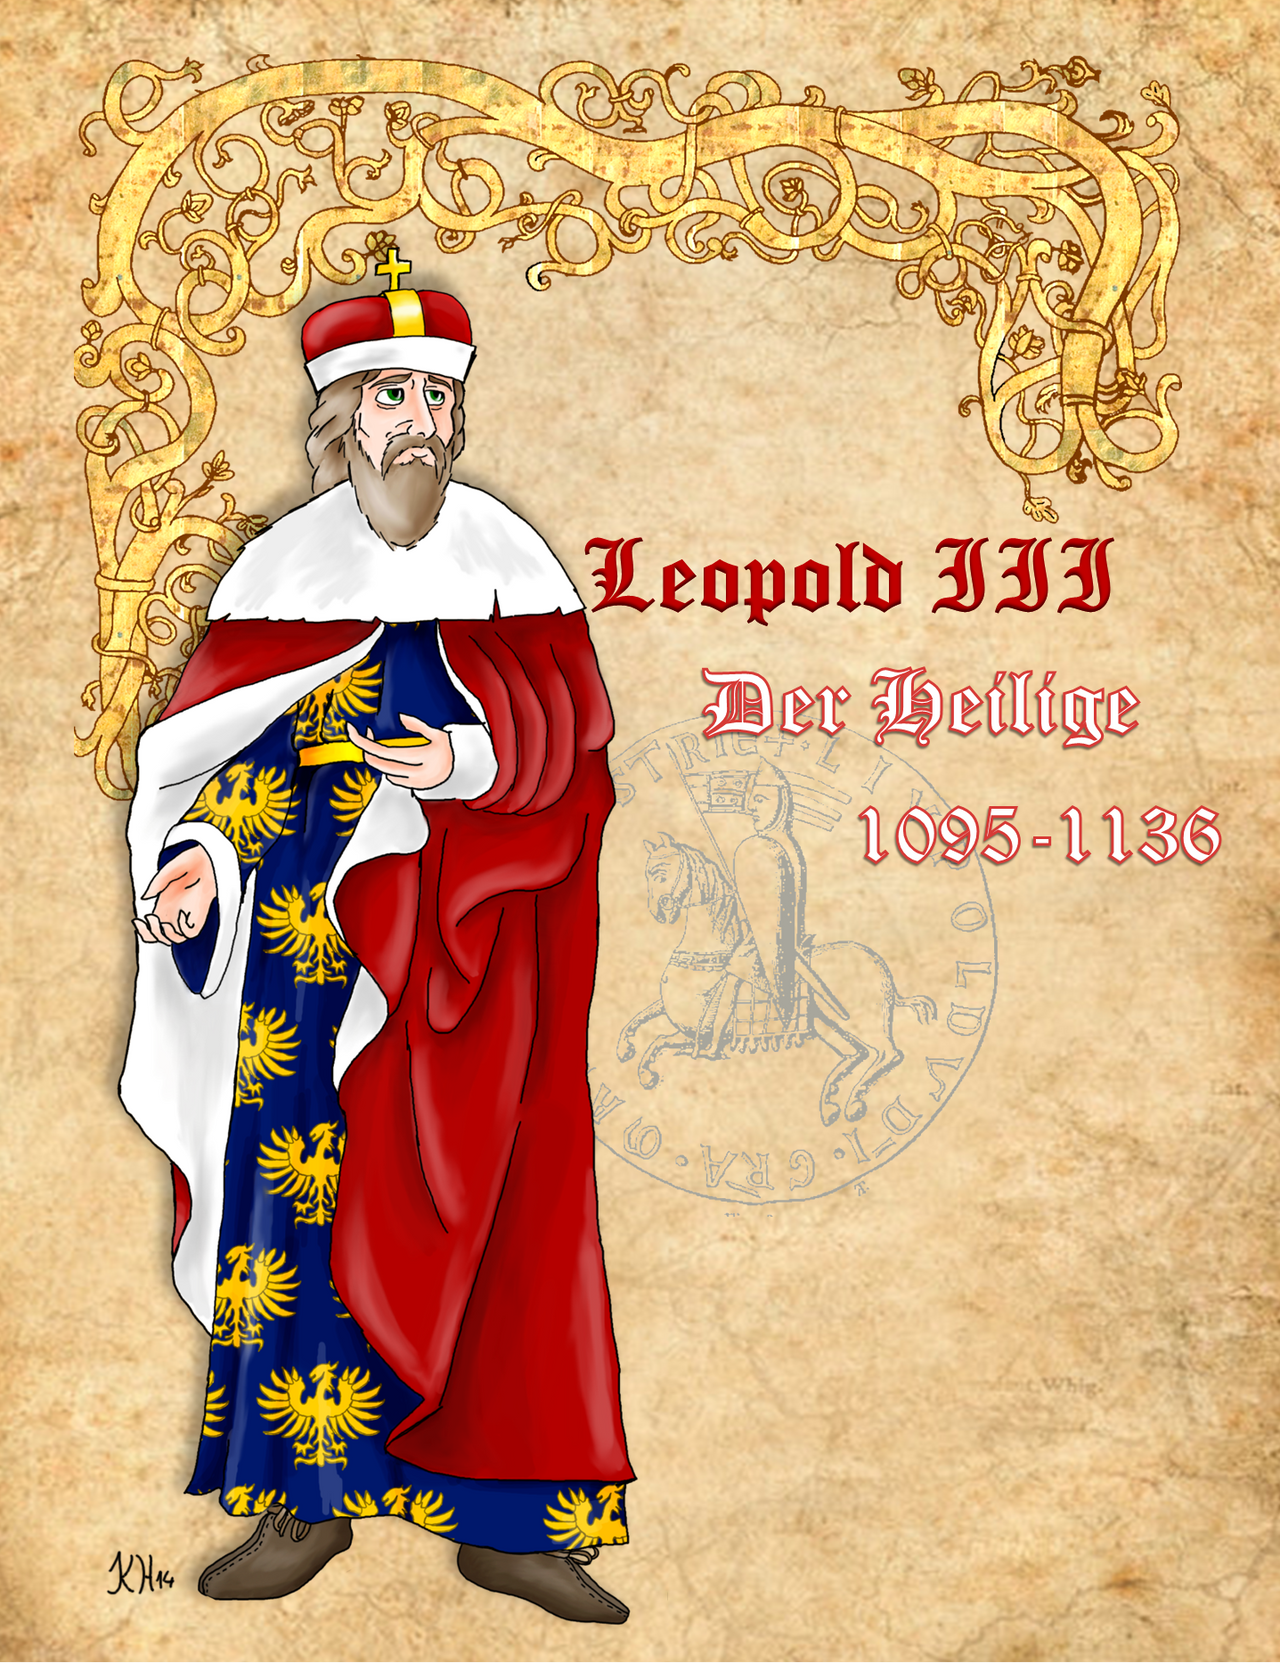 Saint Leopold III of Austria by Pelycosaur24